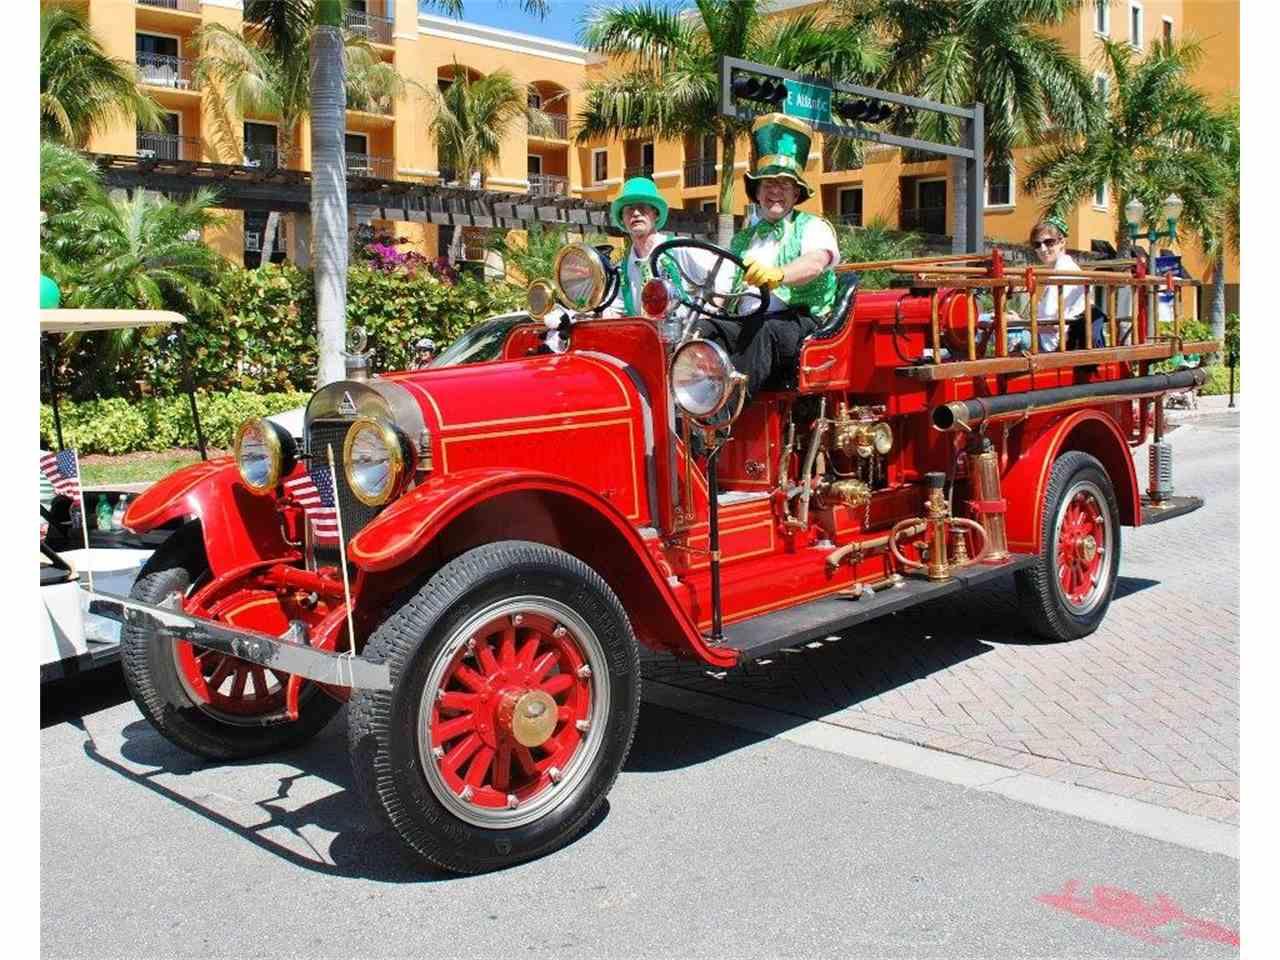 1925 Stutz Model K Firetruck For Sale Classiccars Com